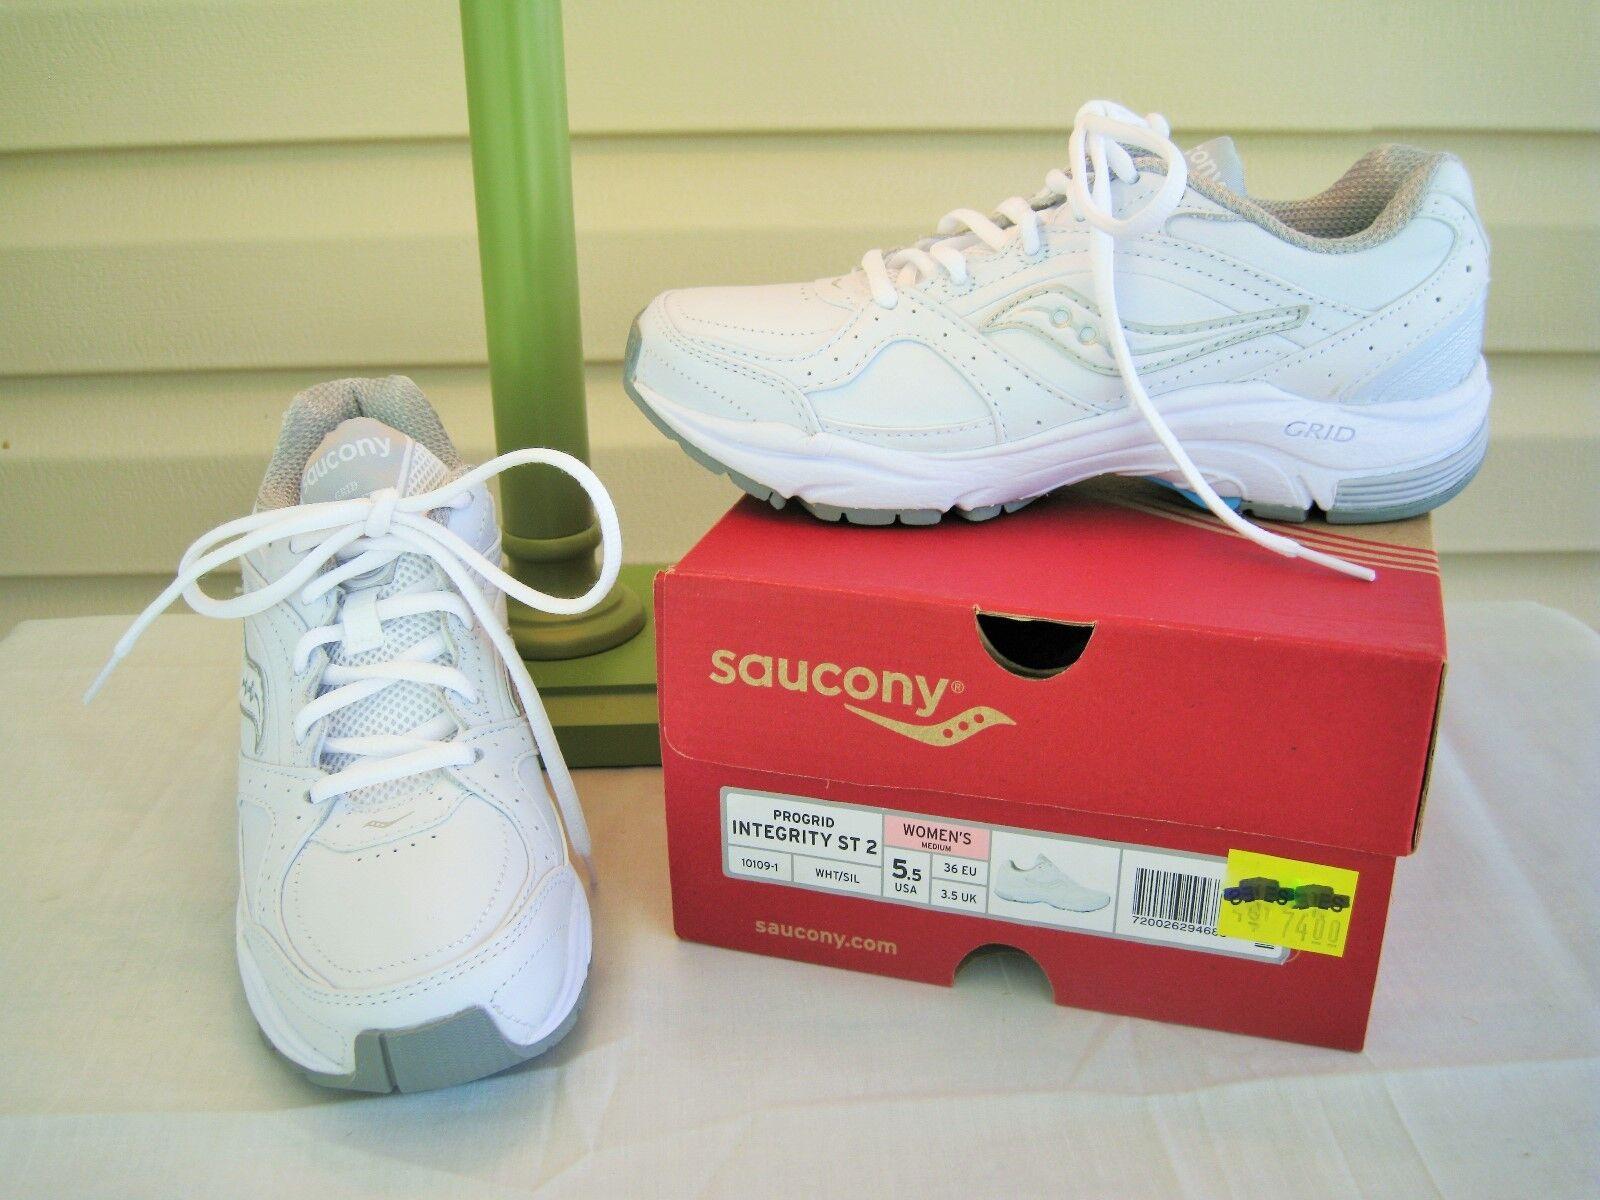 Saucony Integrity Womens White Walking Sneaker - NEW IN BOX